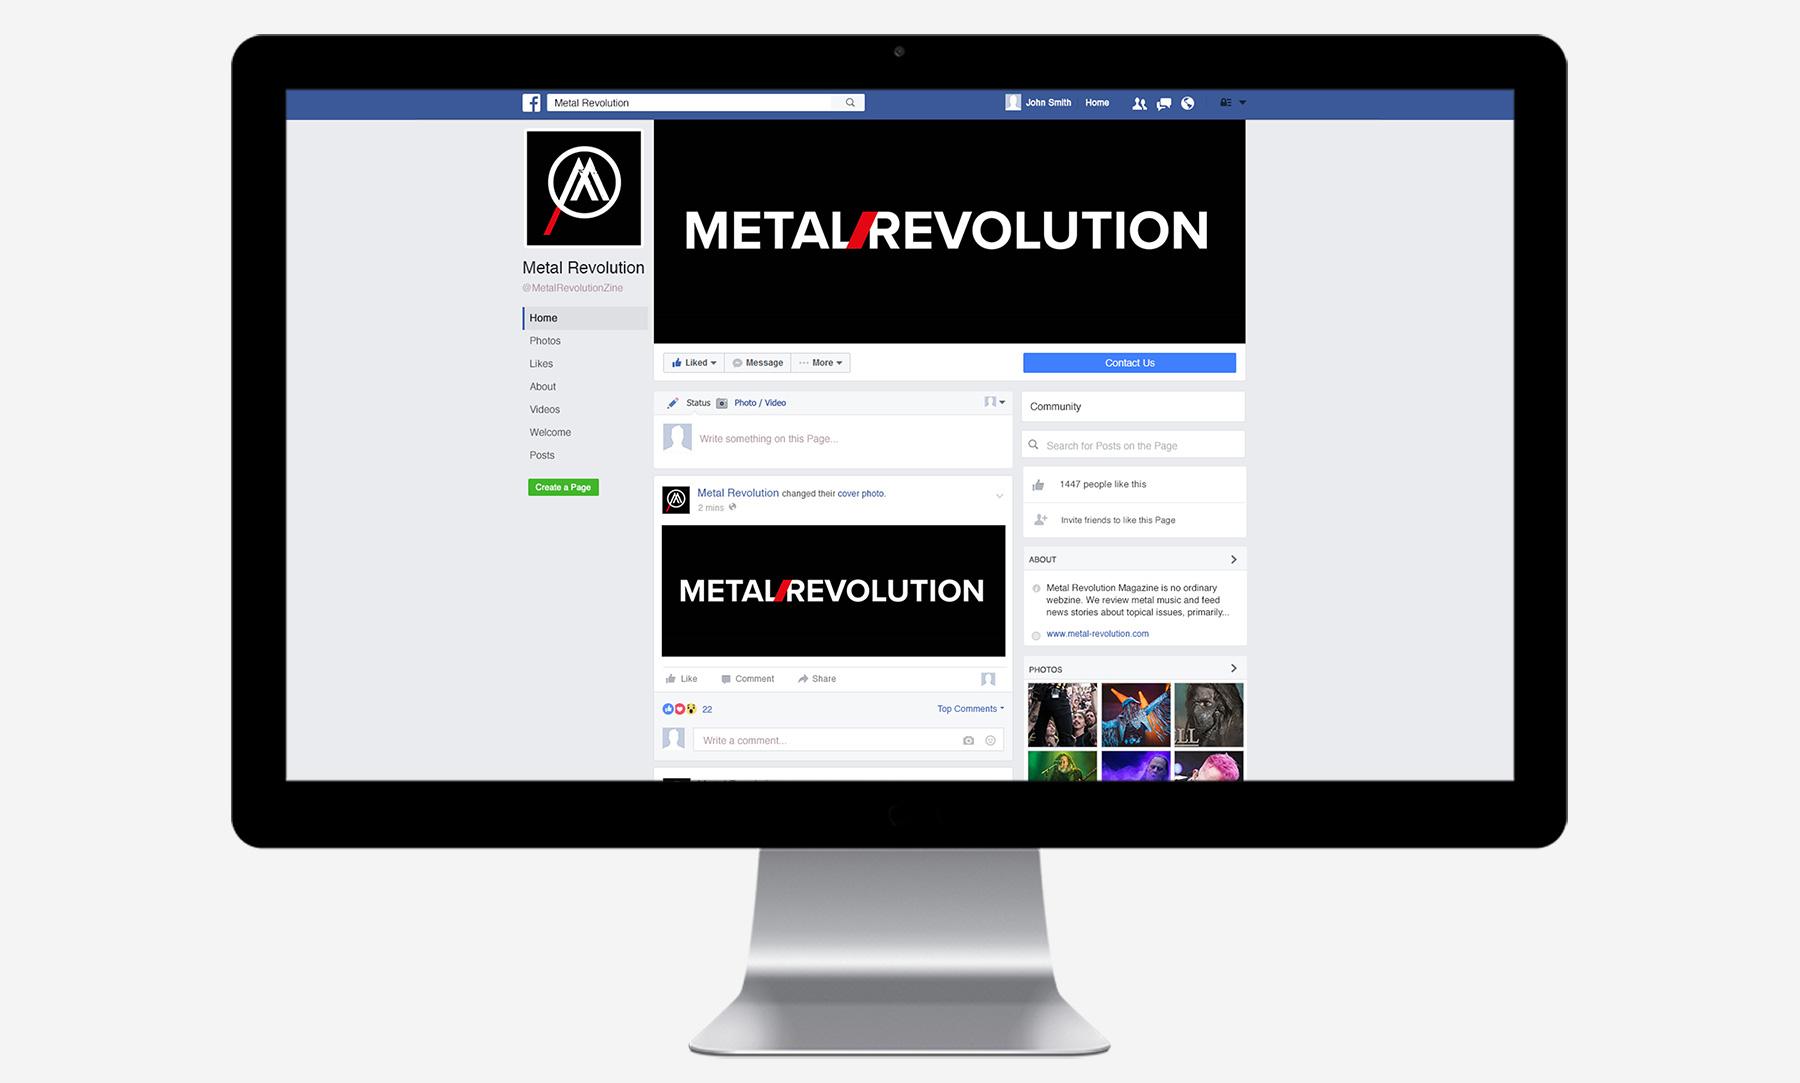 Metal Revolution: Facebook